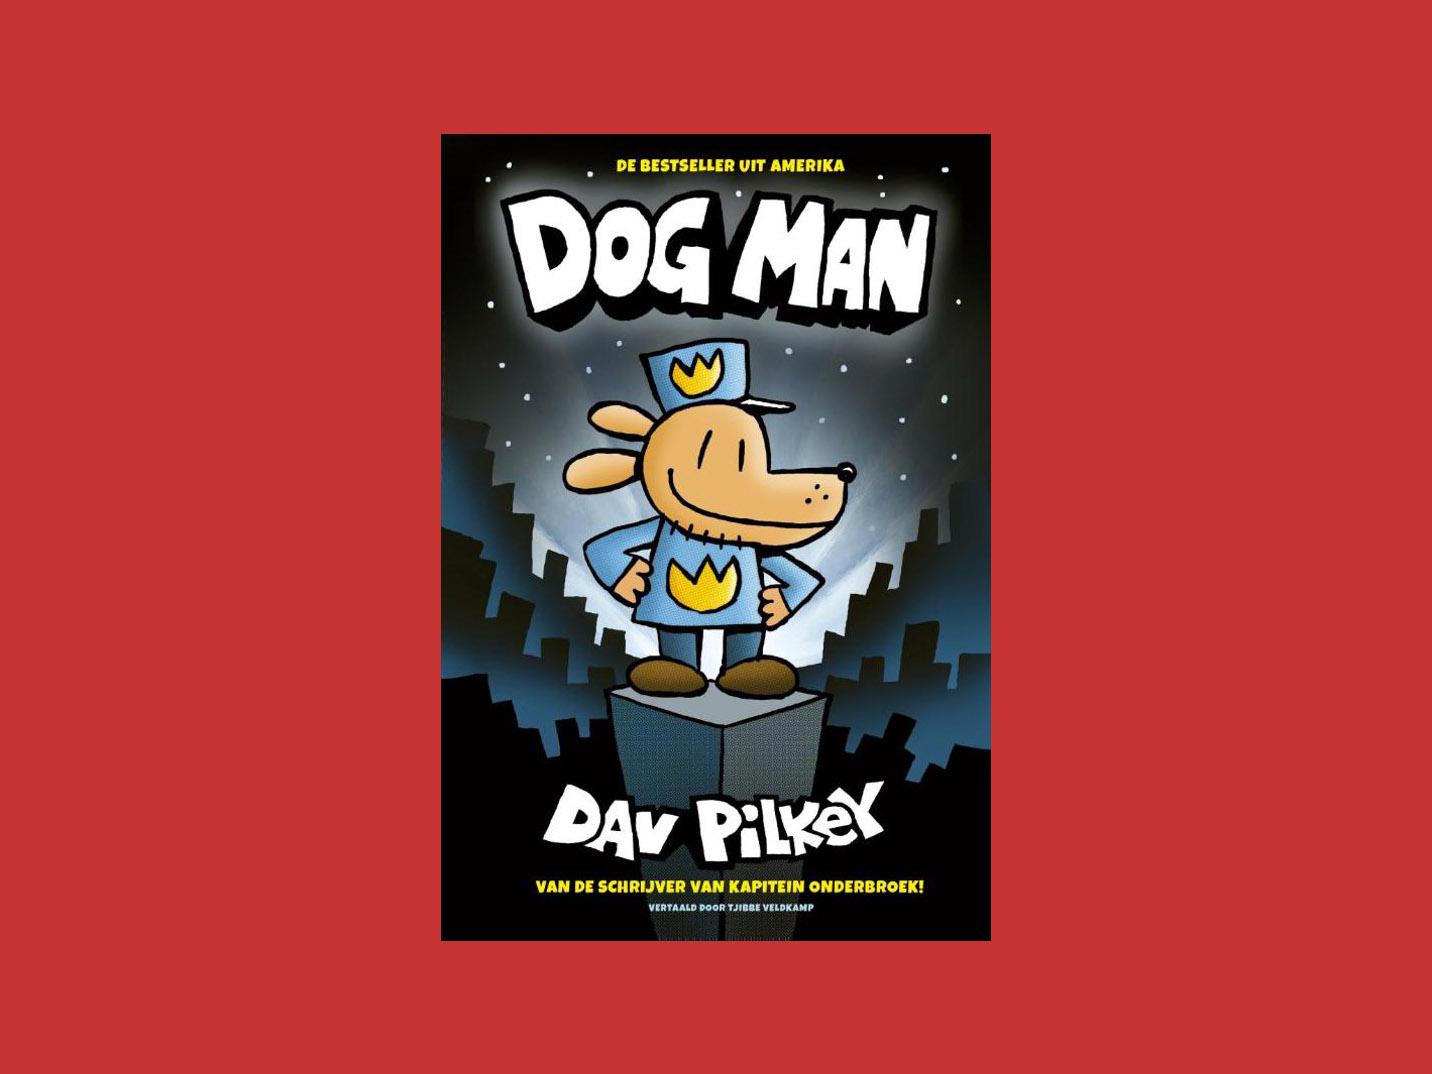 Boekbespreking Dog man